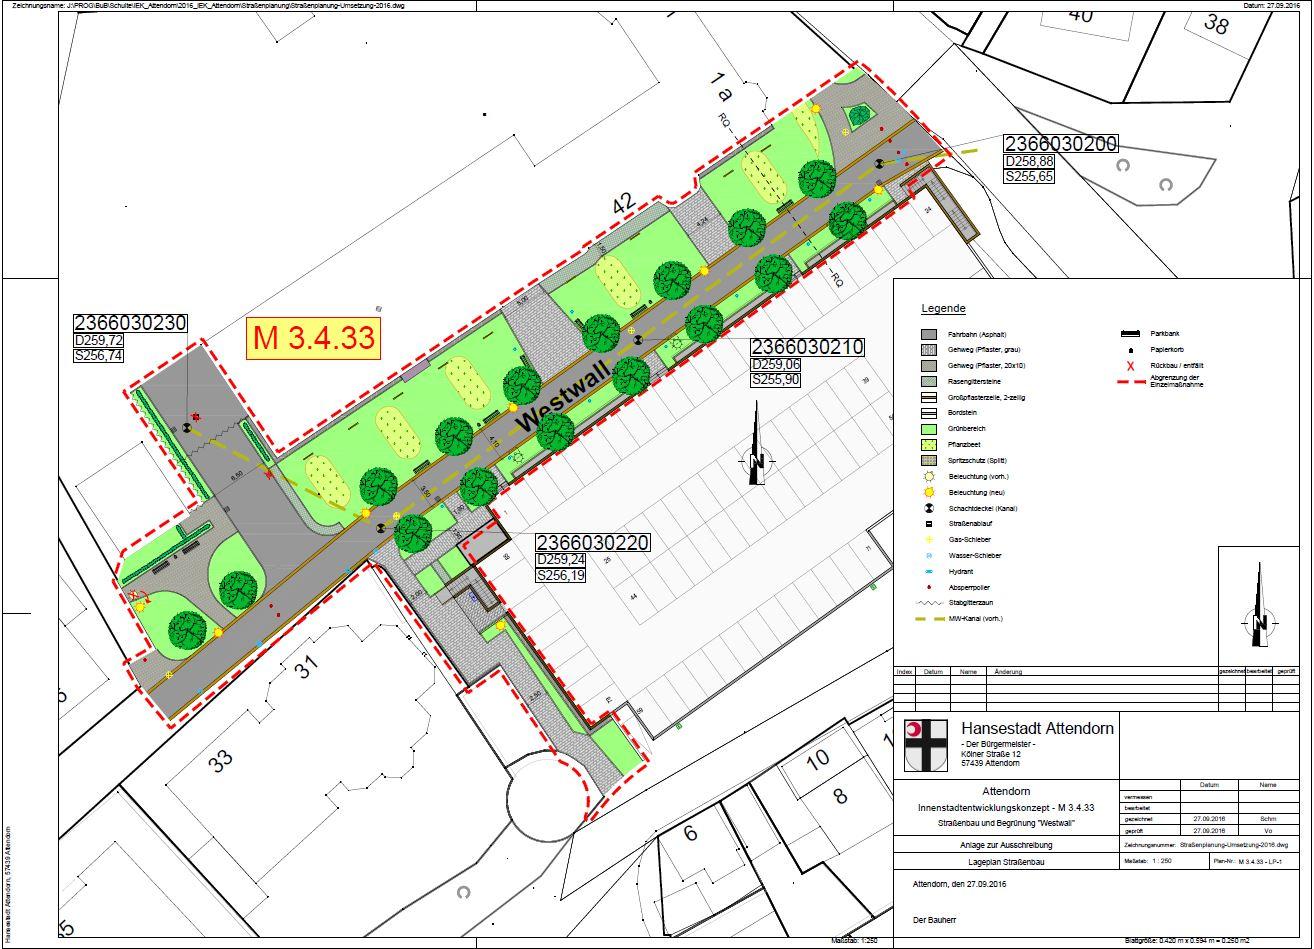 m-3-4-33-teilabschnitt-westwall-strassenplanung